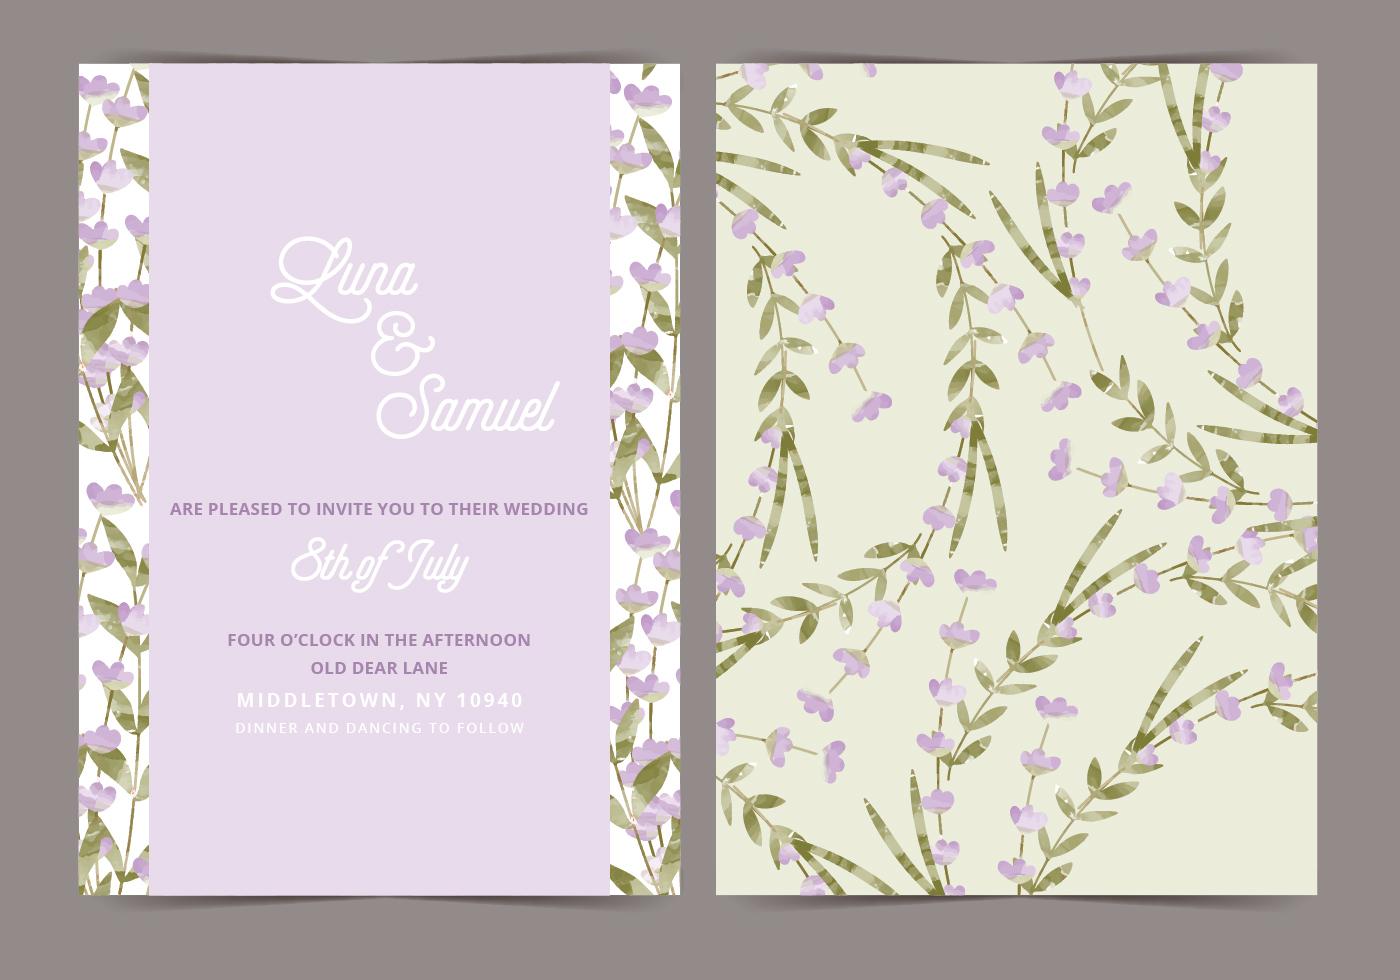 Lavender Vector Wedding Invite - Download Free Vector Art, Stock ...